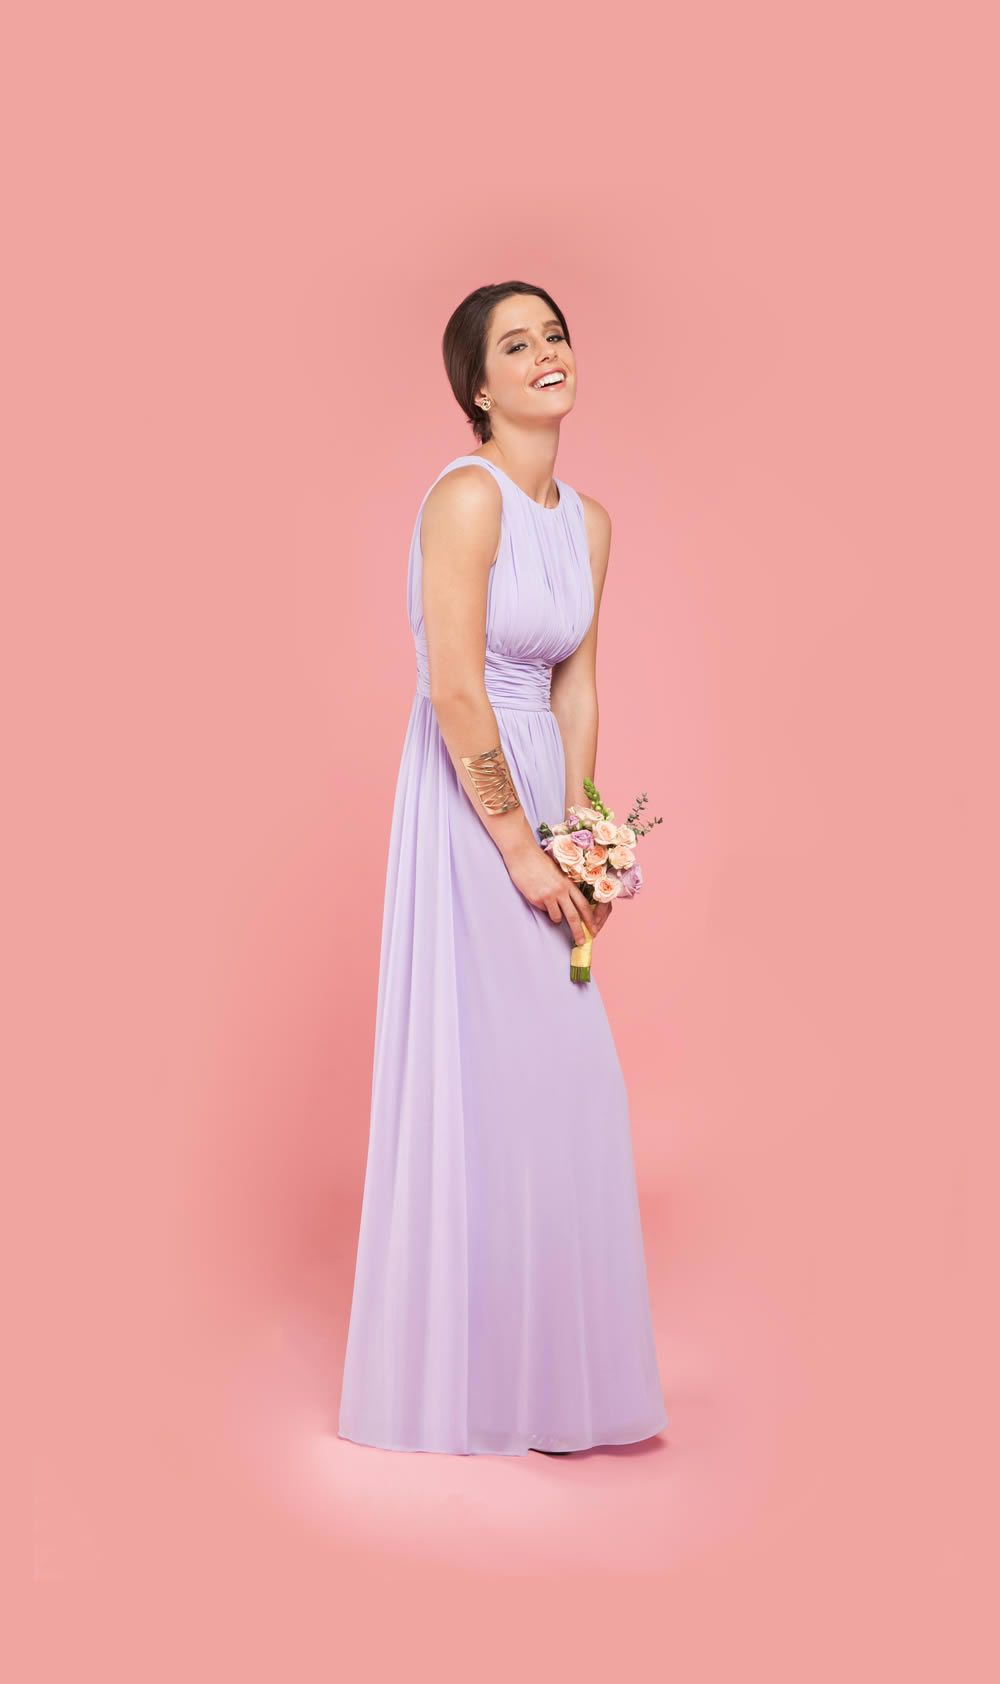 Vestido dama de honor www.bridesmaids.mx #boda #damasdehonor ...